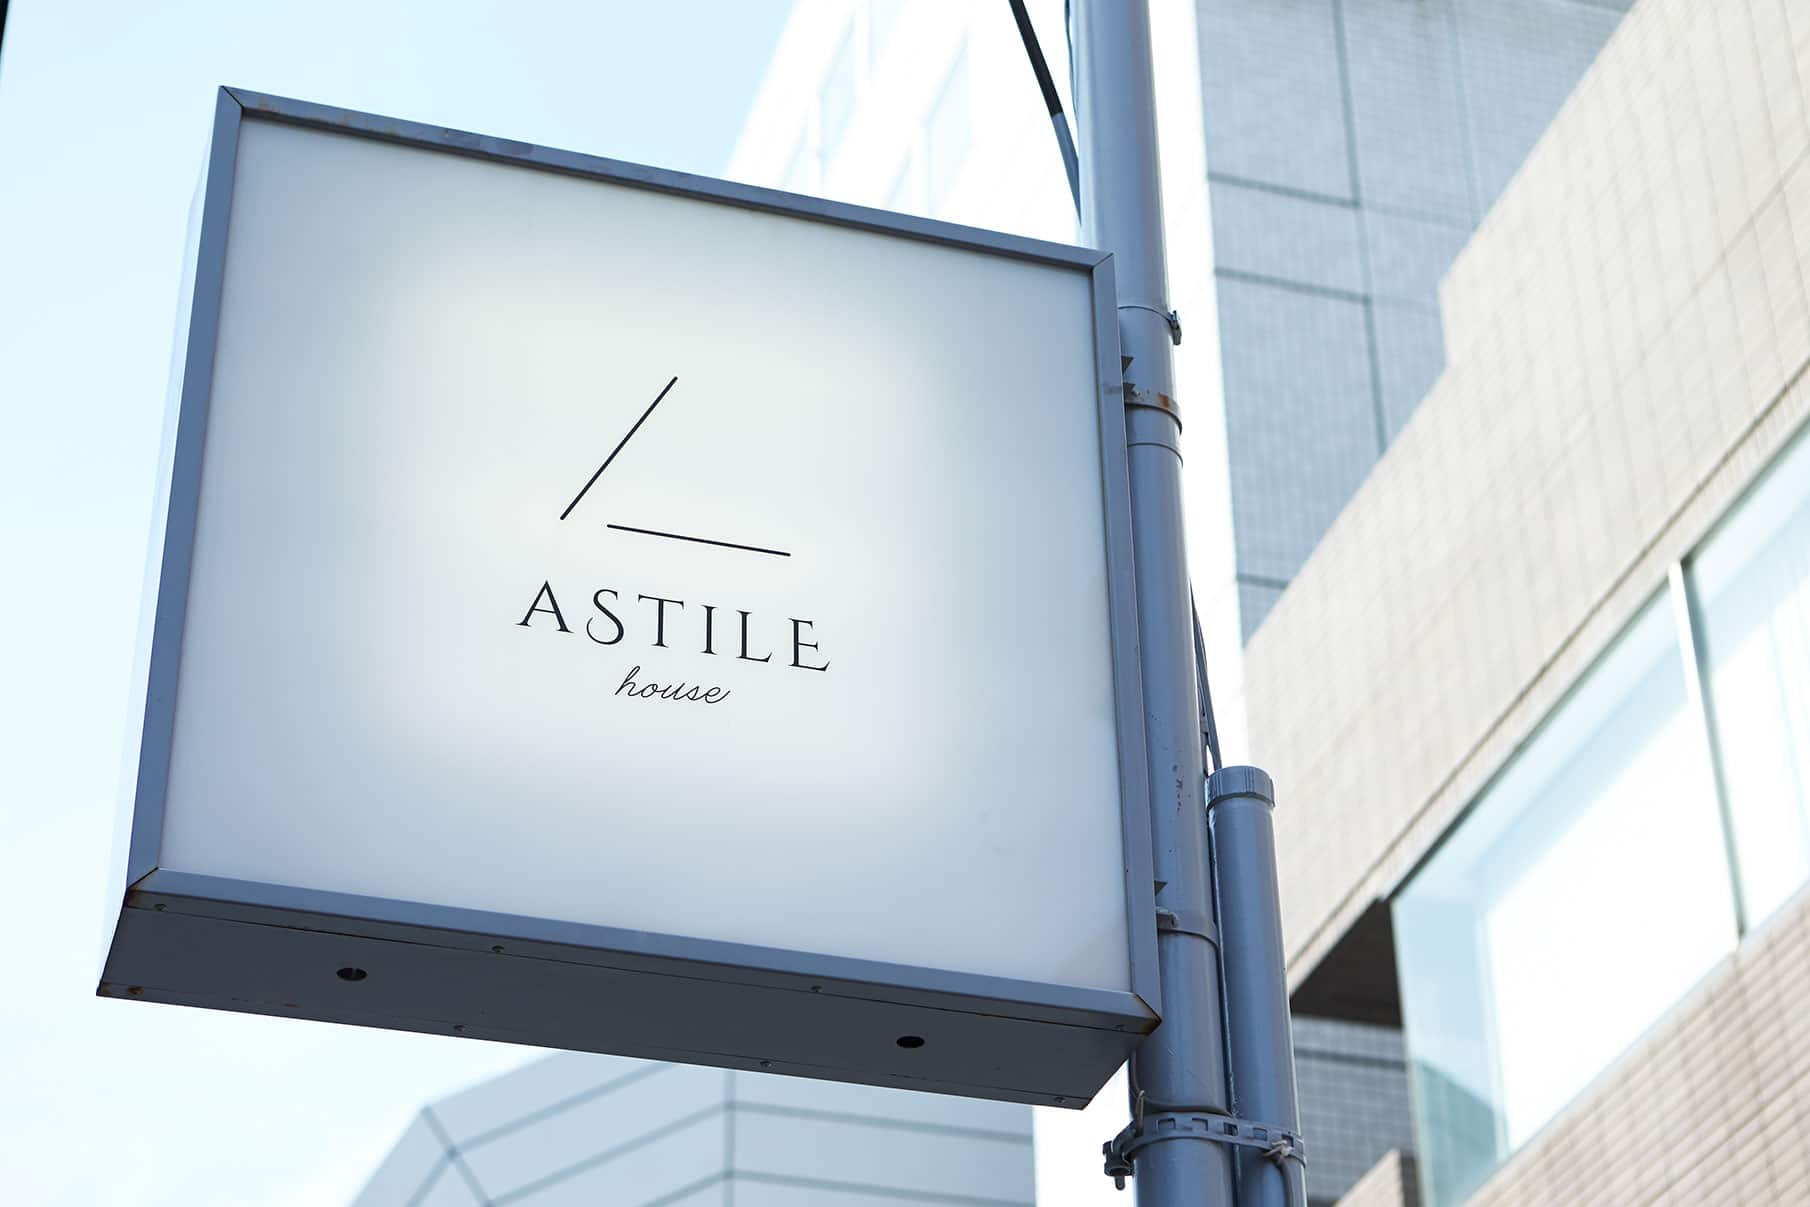 ASTILE house - Brand Identity 3